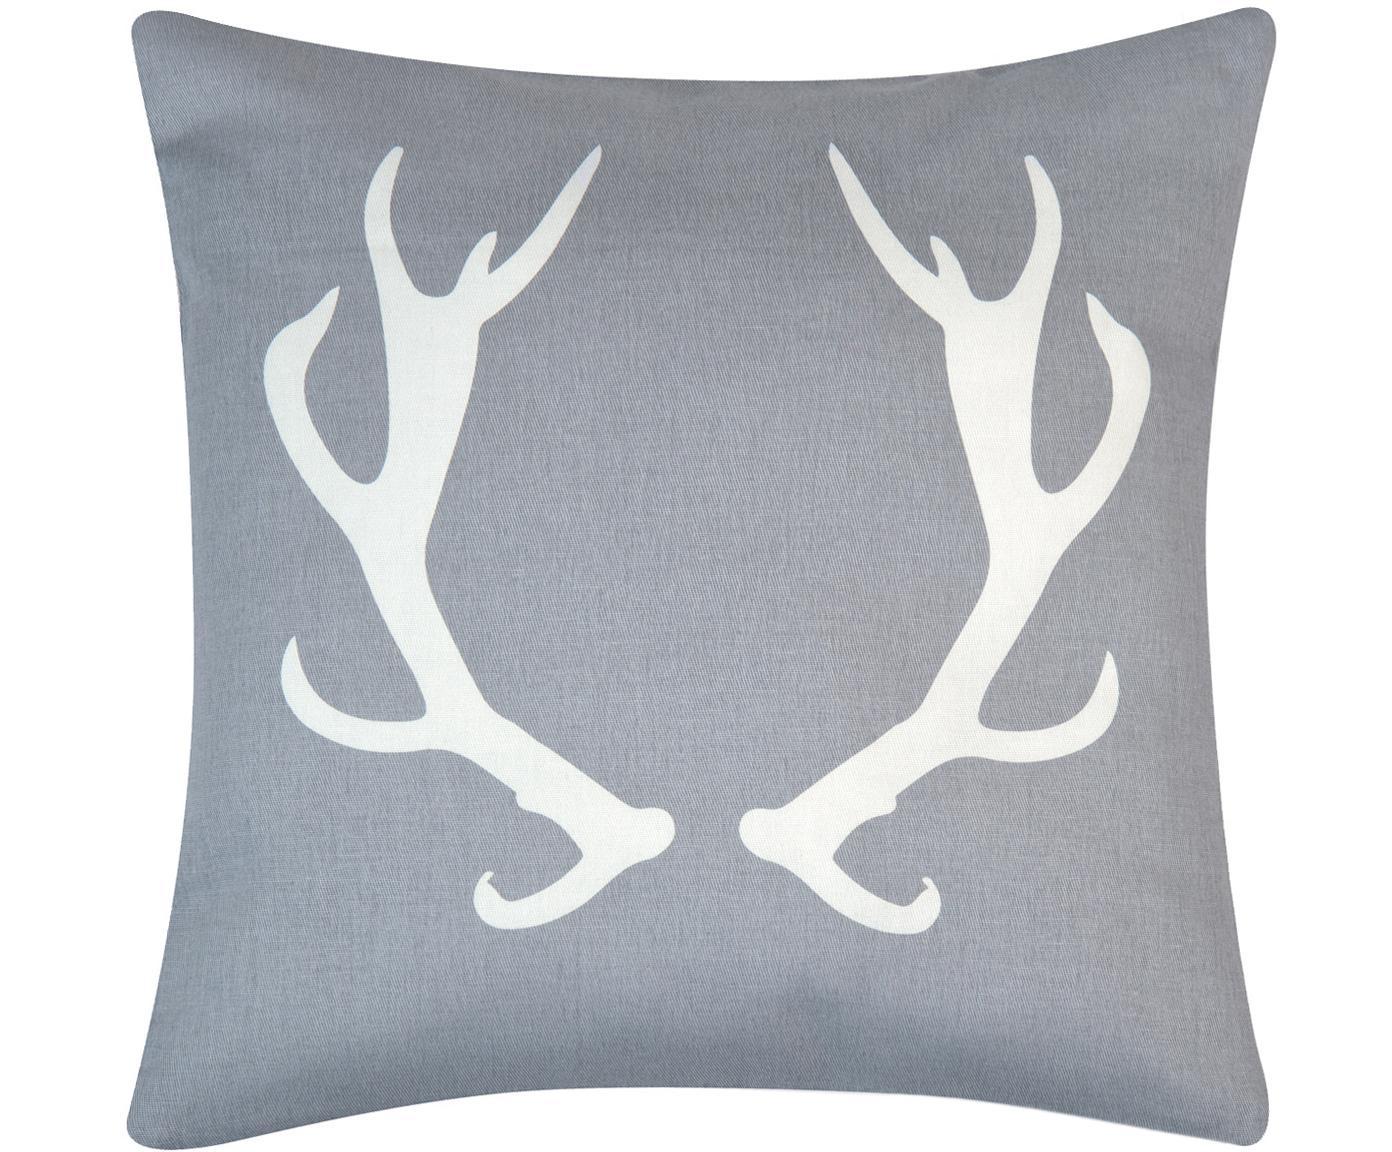 Kissenhülle Horns in Grau/Weiss mit Geweih, Baumwolle, Panamabindung, Grau,Ecru, 40 x 40 cm